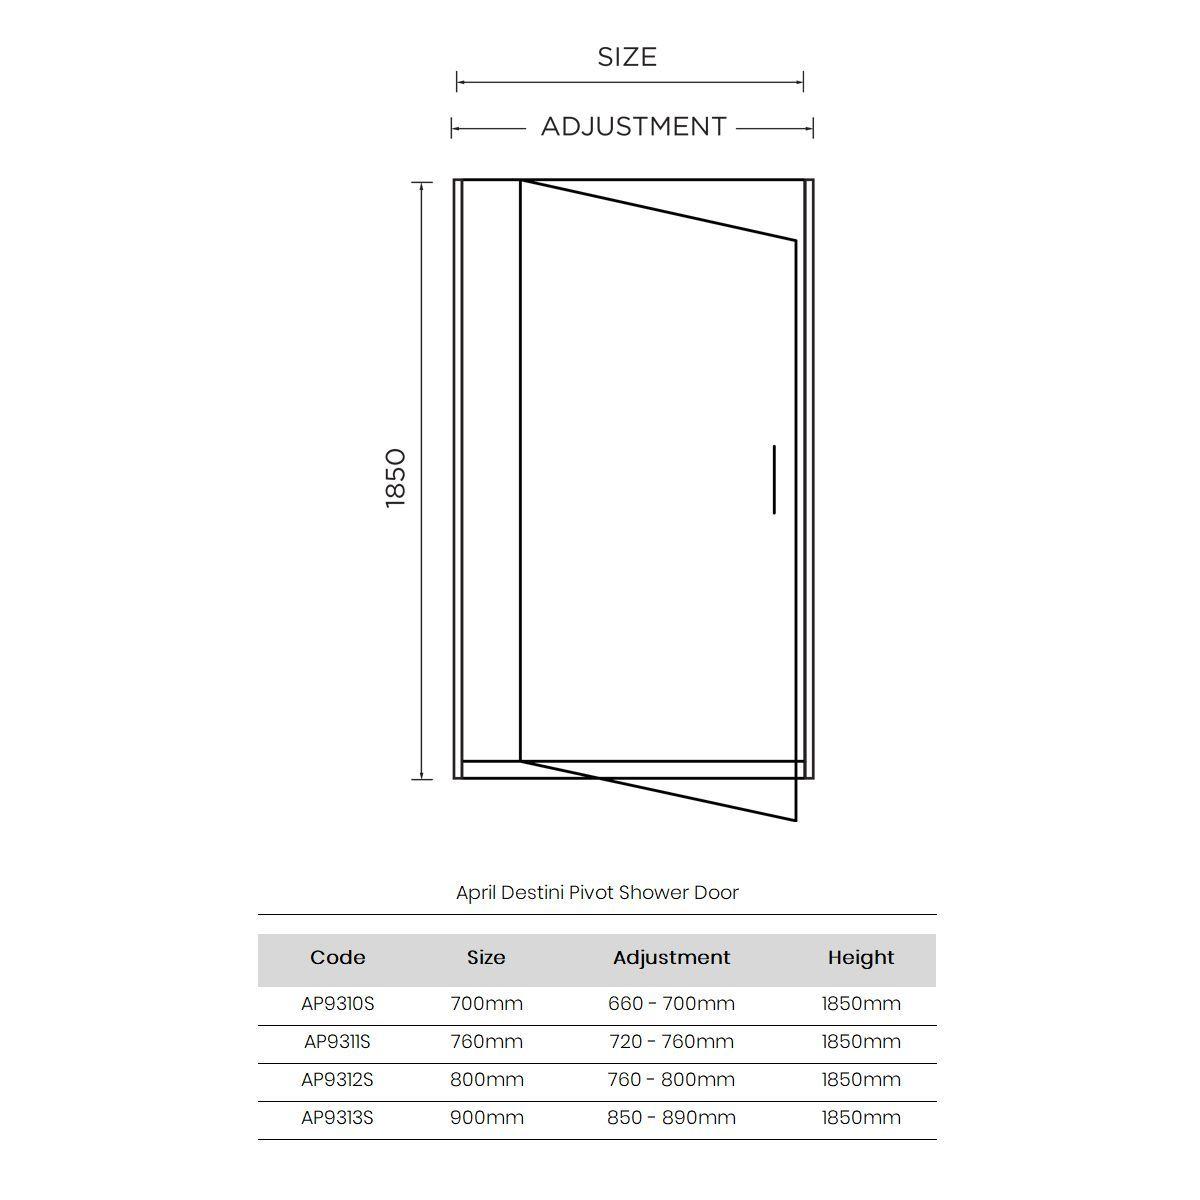 April Destini Pivot Shower Door with Optional Side Panel Dimensions